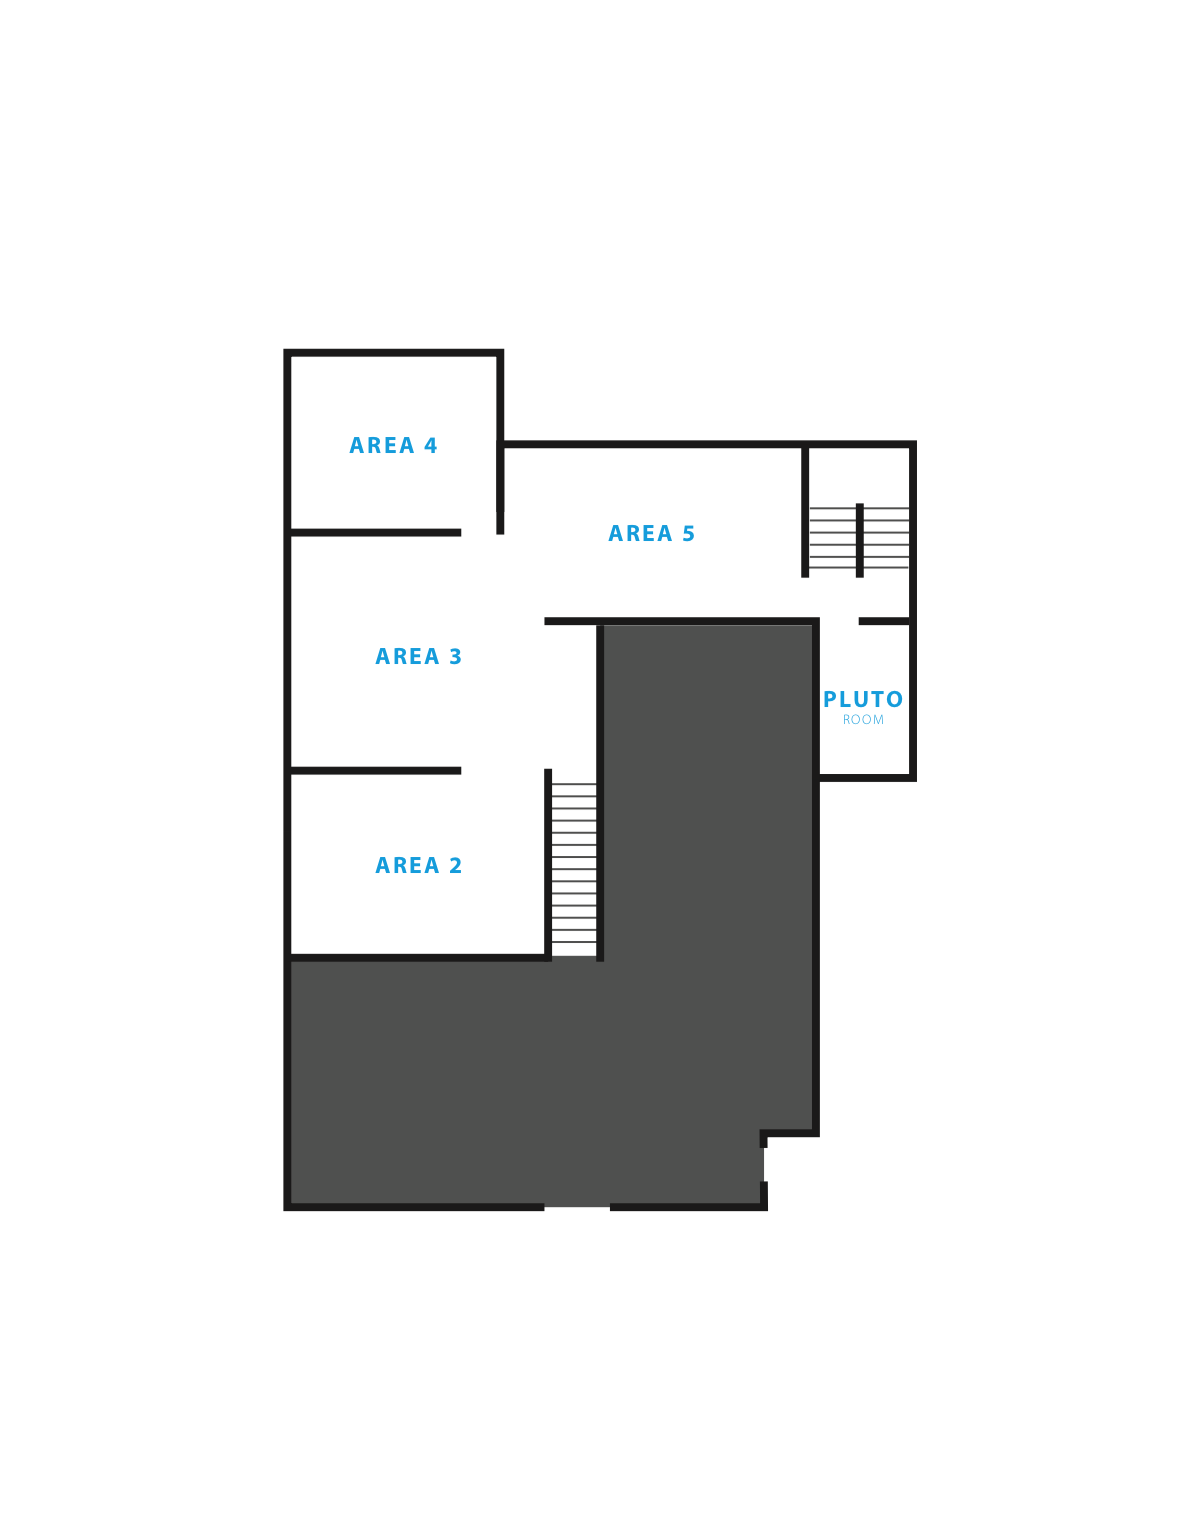 areamap_upstairs